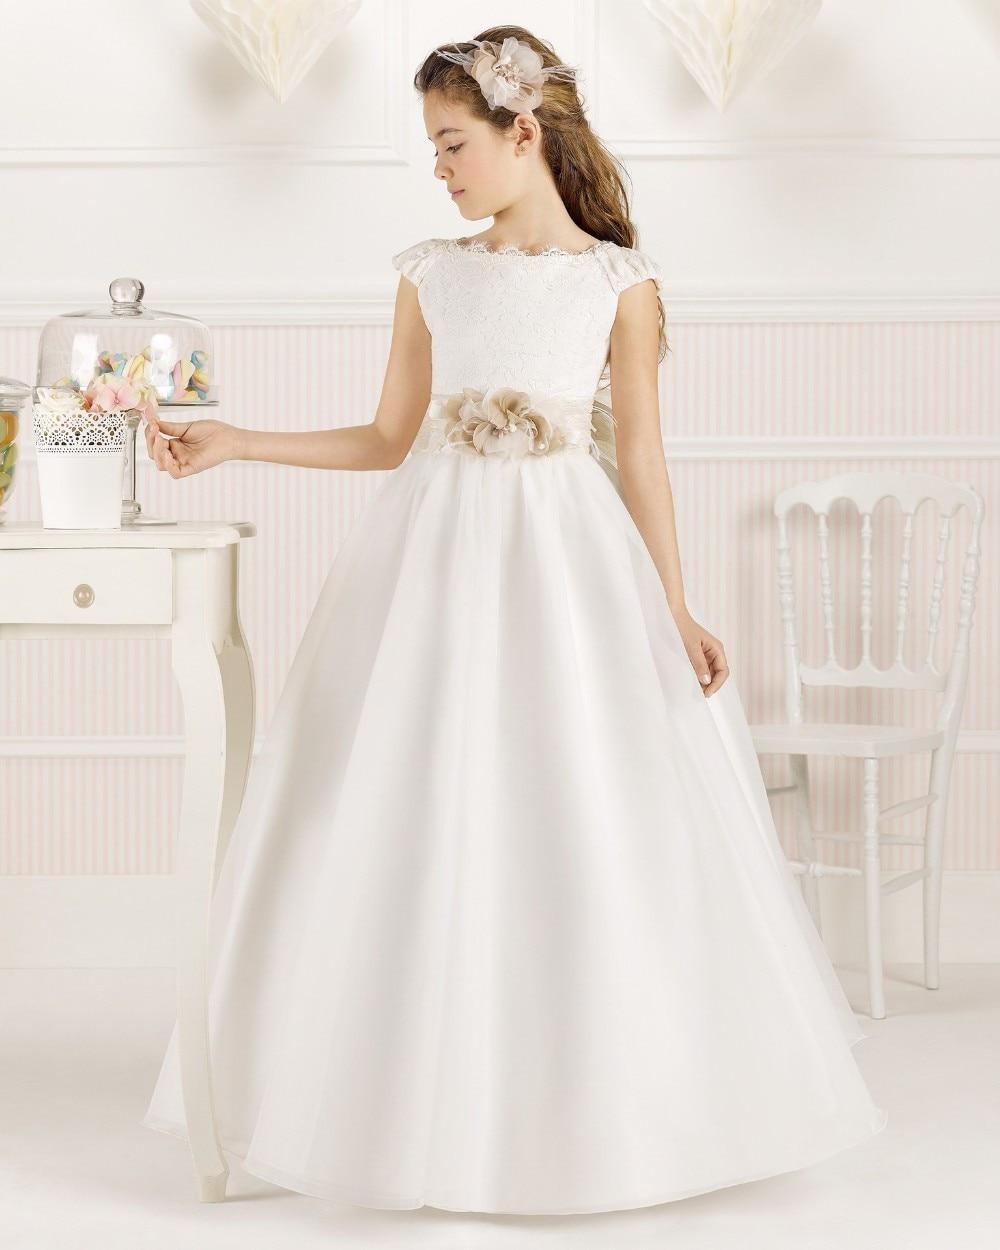 Cap Sleeves  2019 Flower Girl Dresses For Weddings A-line Flowers Lace Beaded Long First Communion Dresses For Little Girls